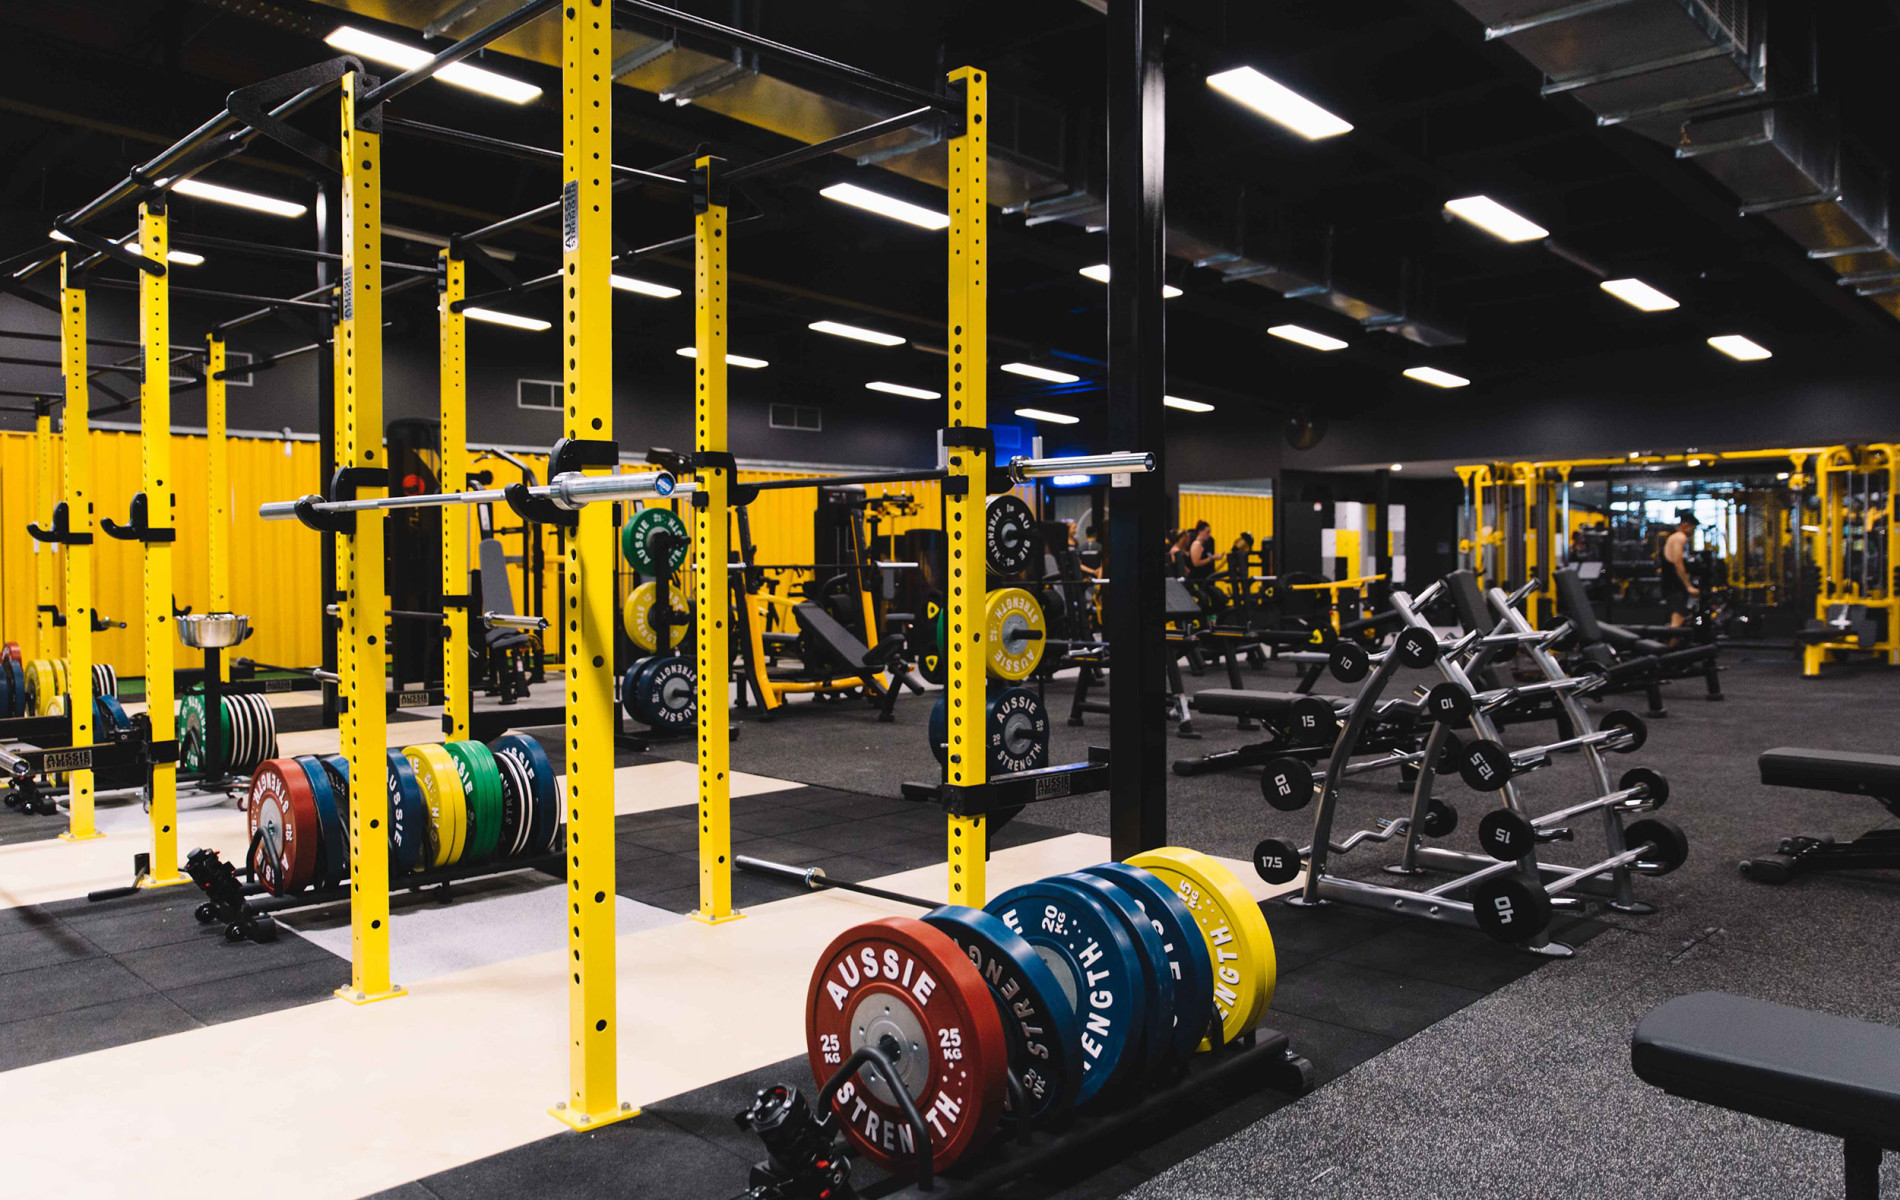 Fitness_playground_gym_darwin_palmerston_gateway_main